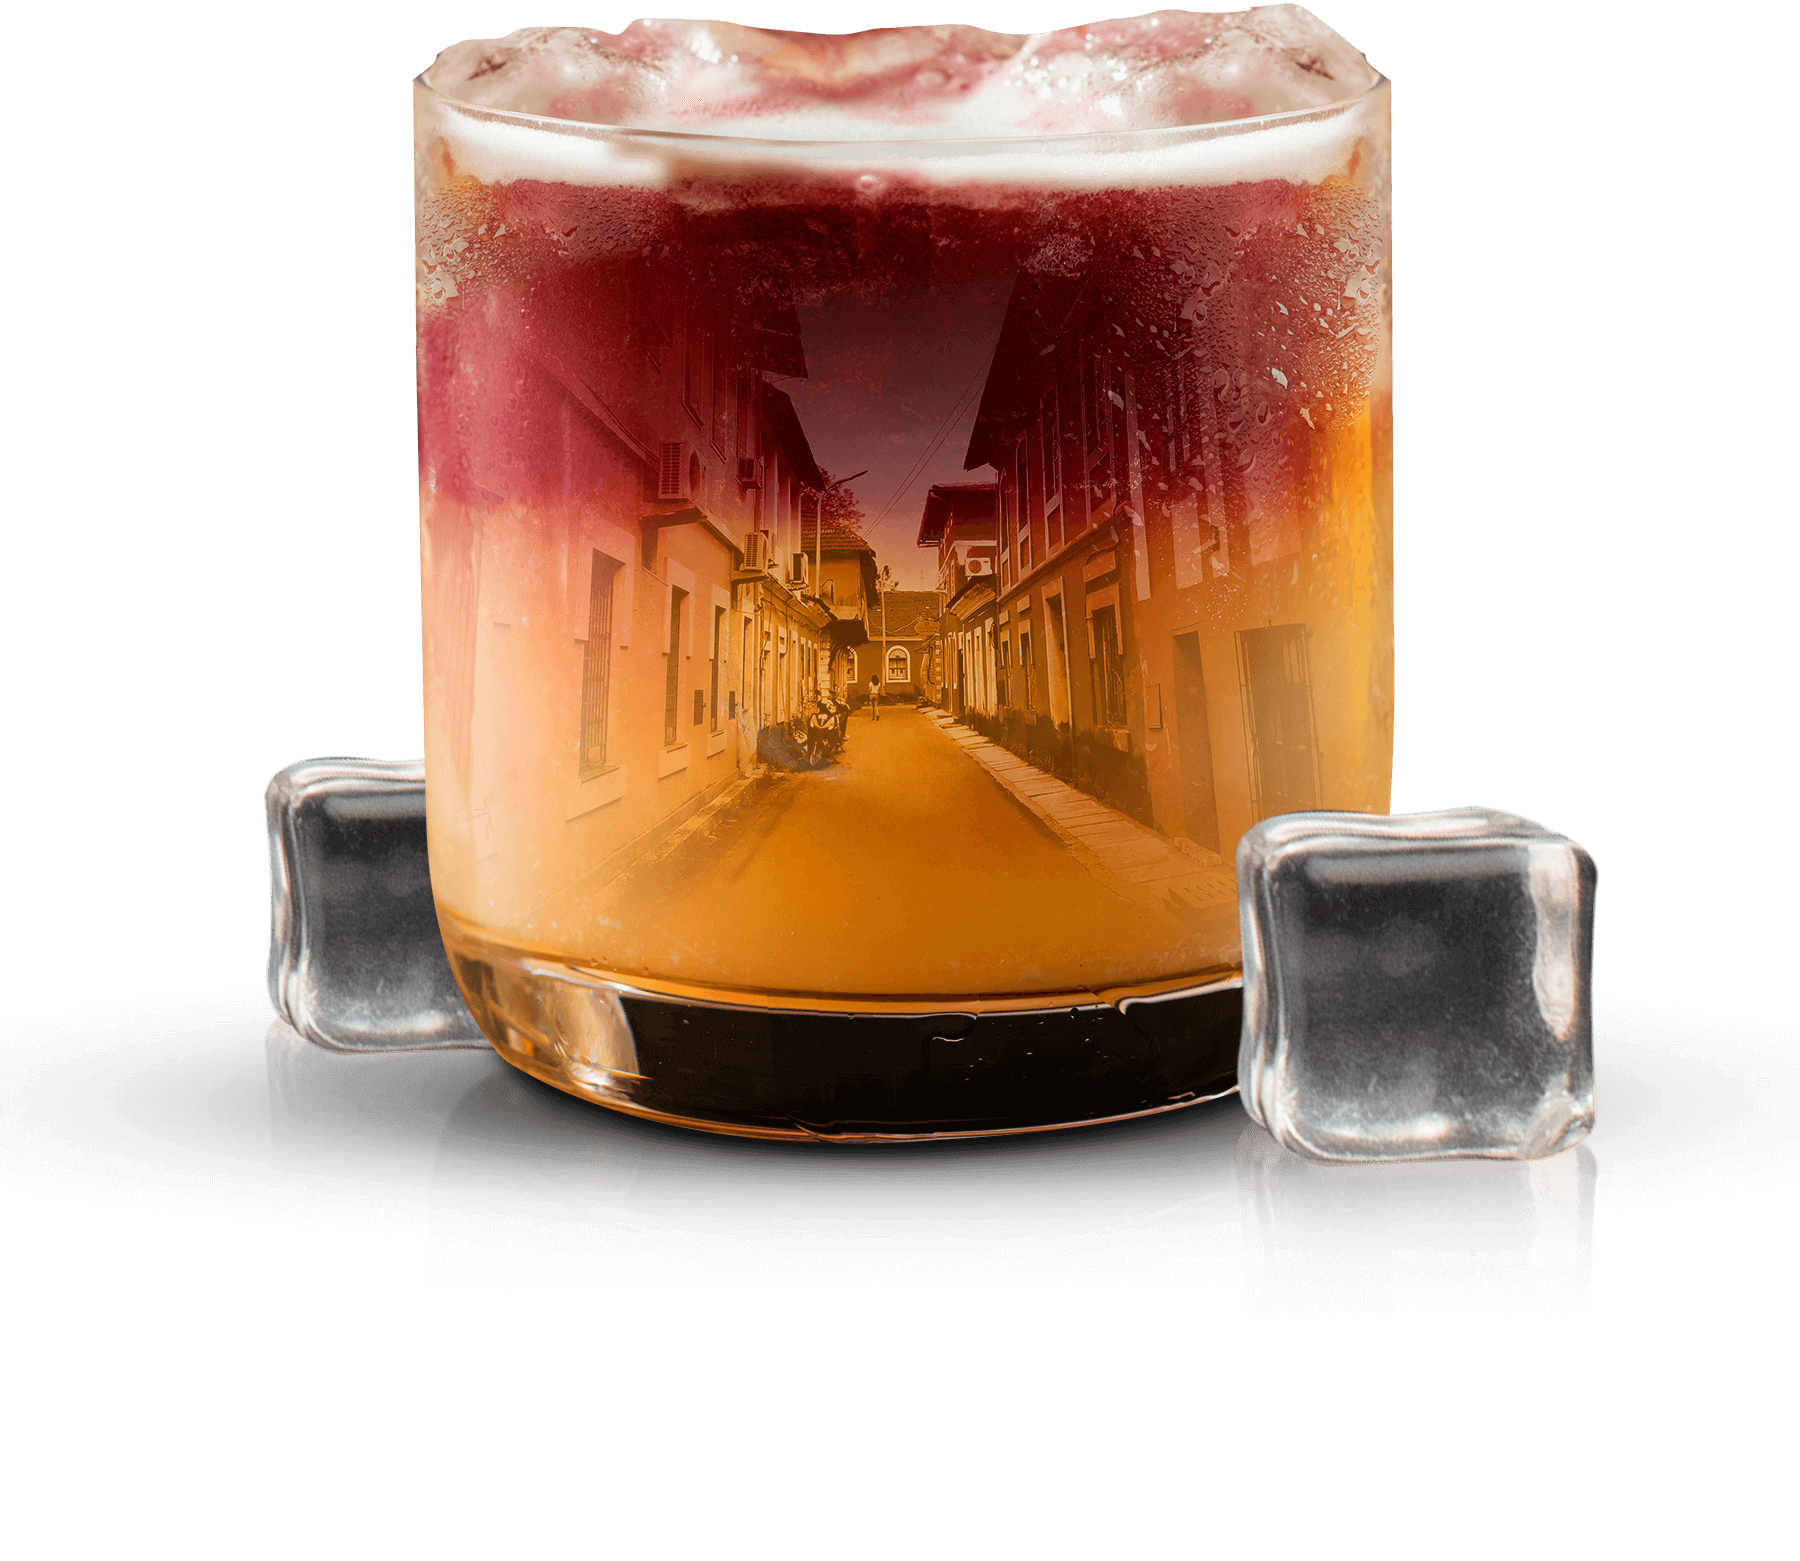 oaksmith gold goa inspired cocktail